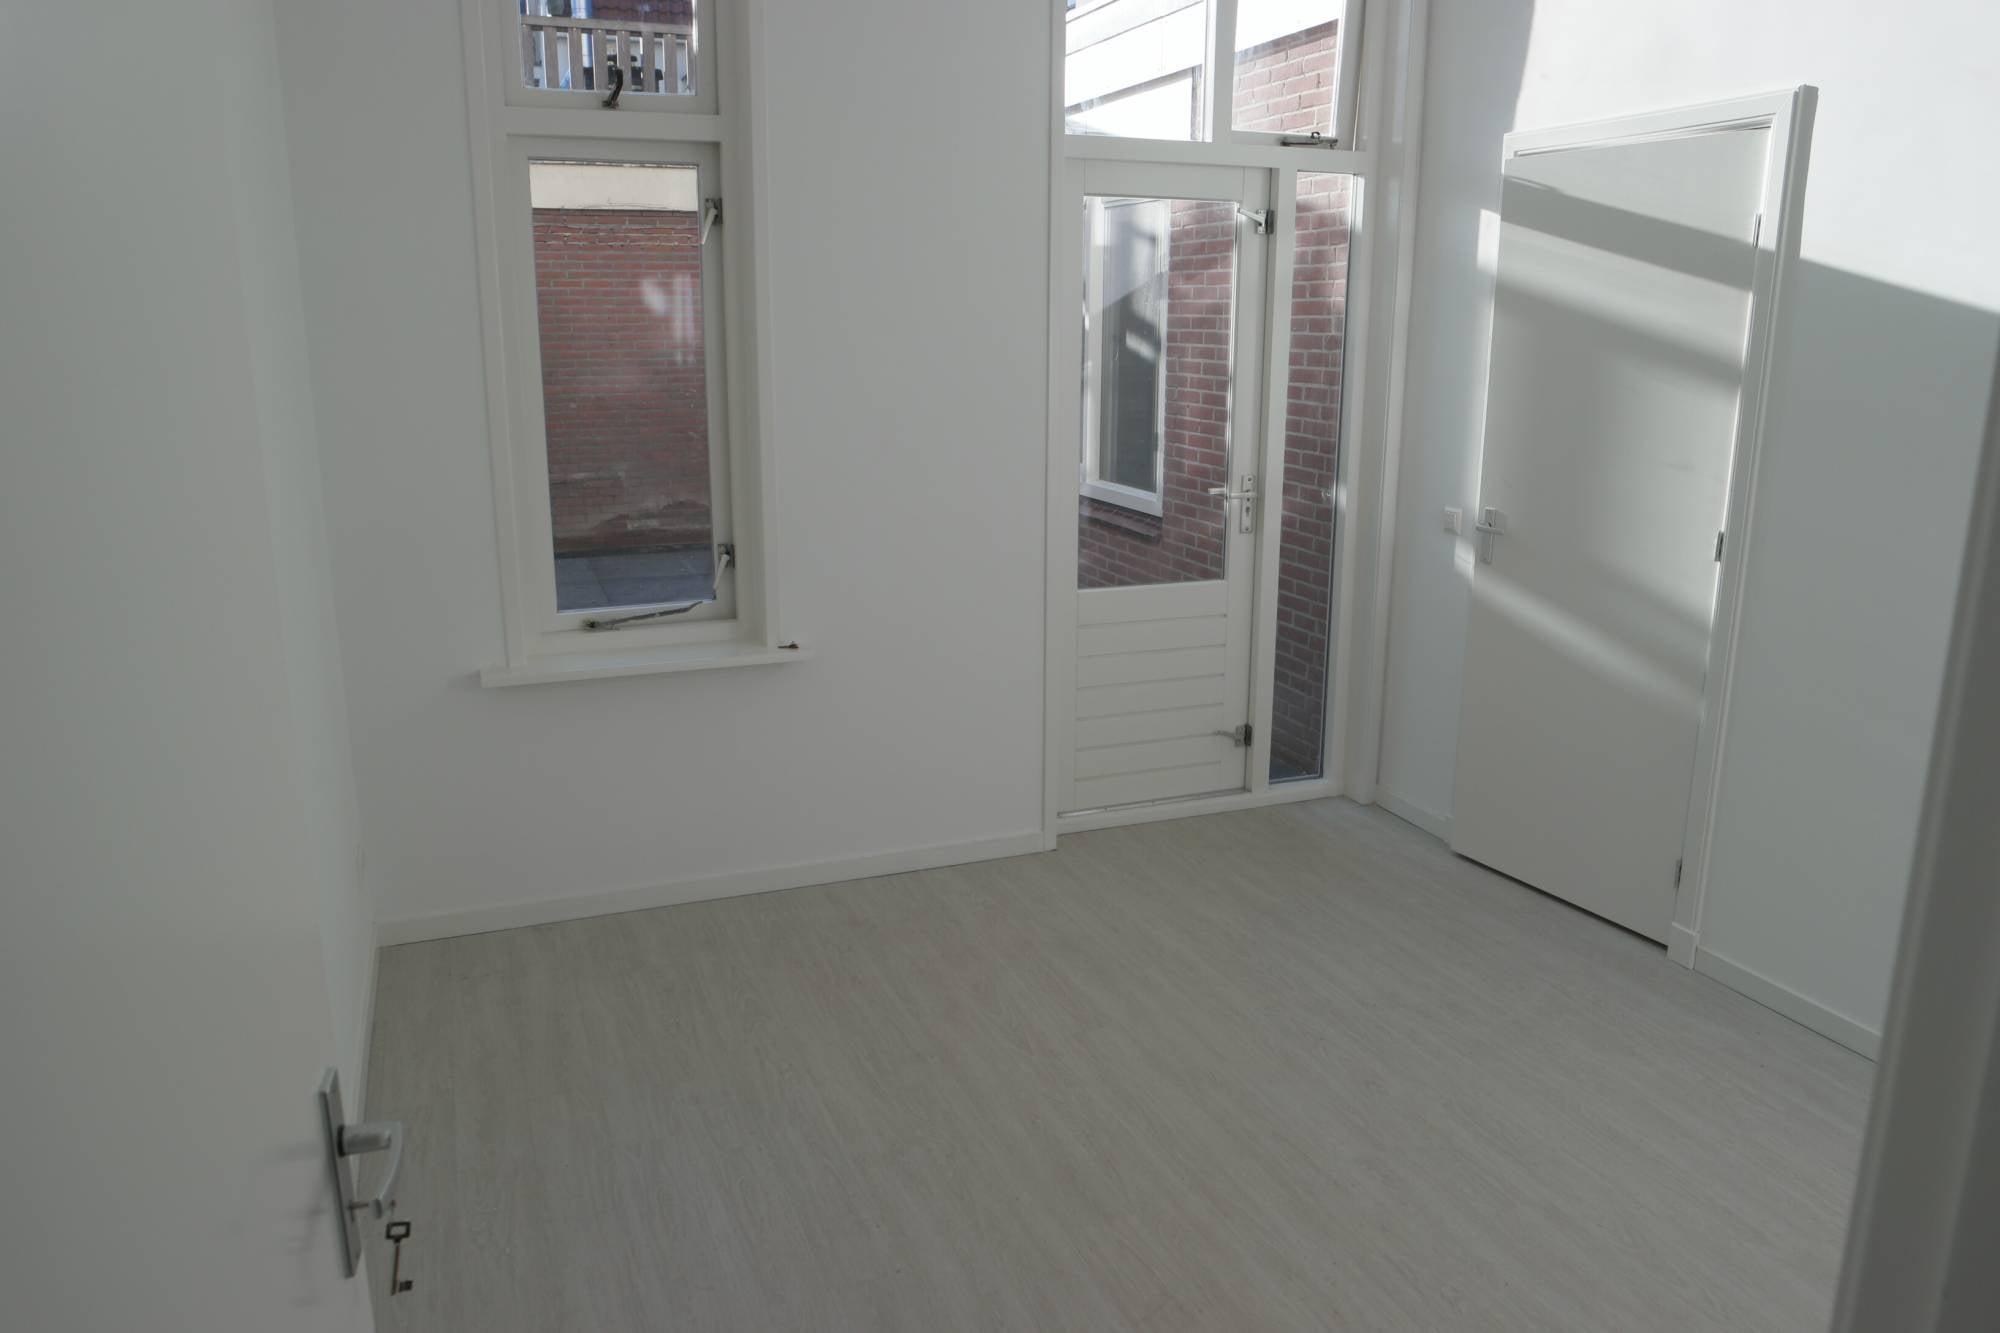 https://public.parariusoffice.nl/216/photos/huge/51872916.1543920736-741.JPG